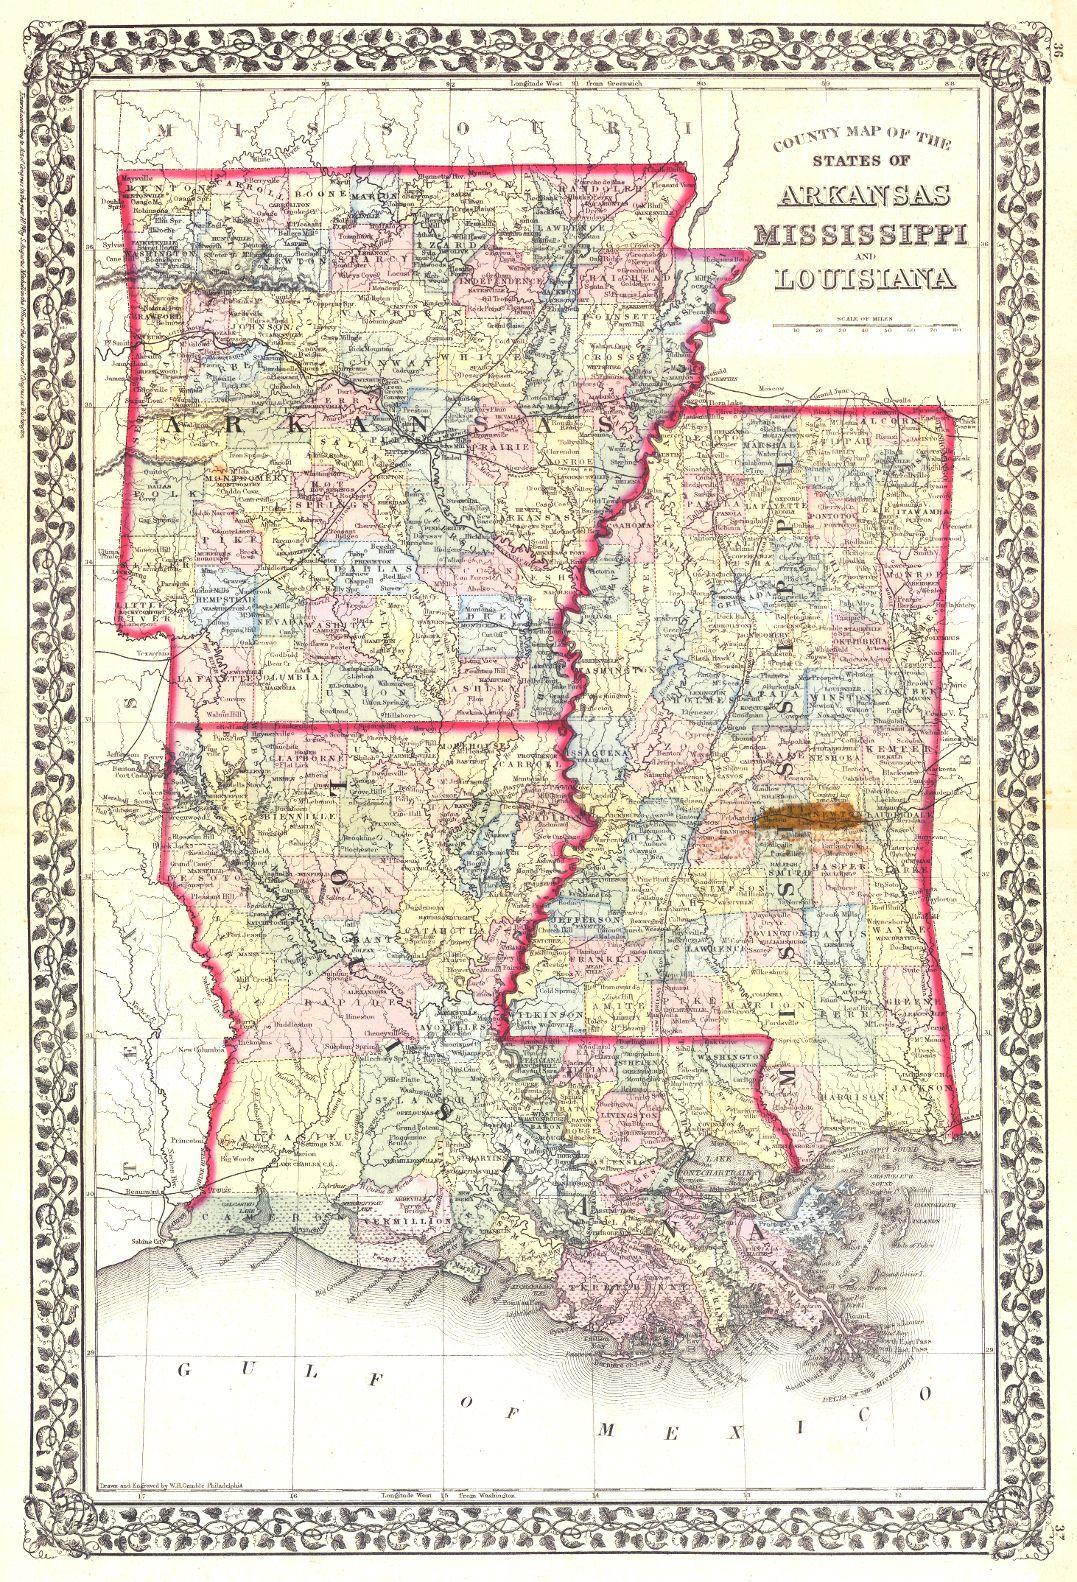 Arkansas And Louisiana Map.County Map Of The States Of Arkansas Mississippi And Louisiana S